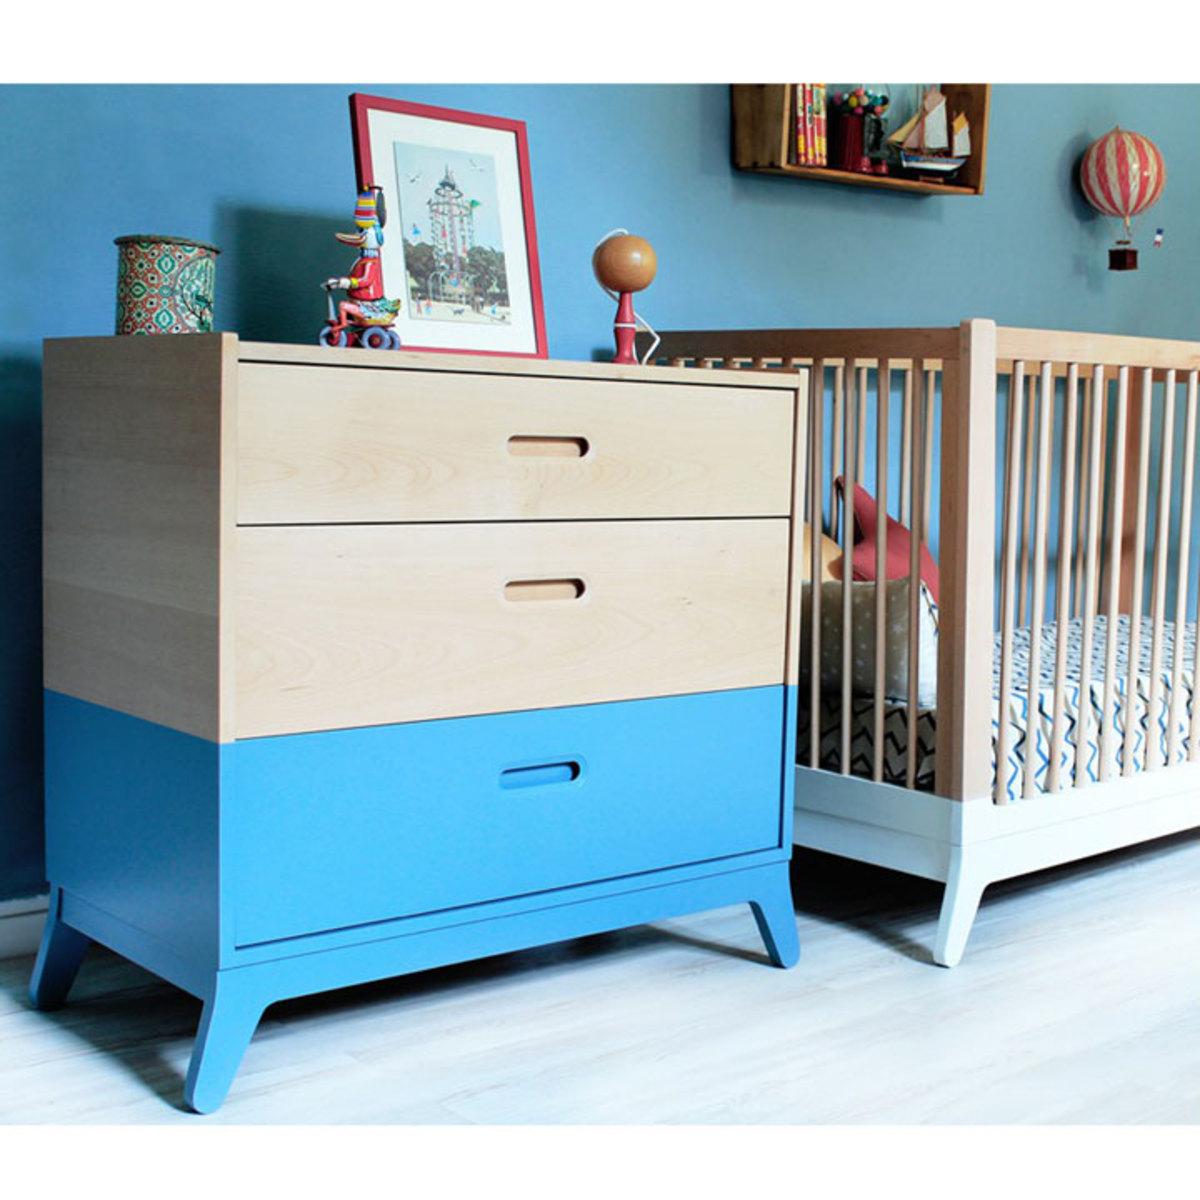 commode horizon bleu thalassa 2000000034751 achat vente commode sur. Black Bedroom Furniture Sets. Home Design Ideas